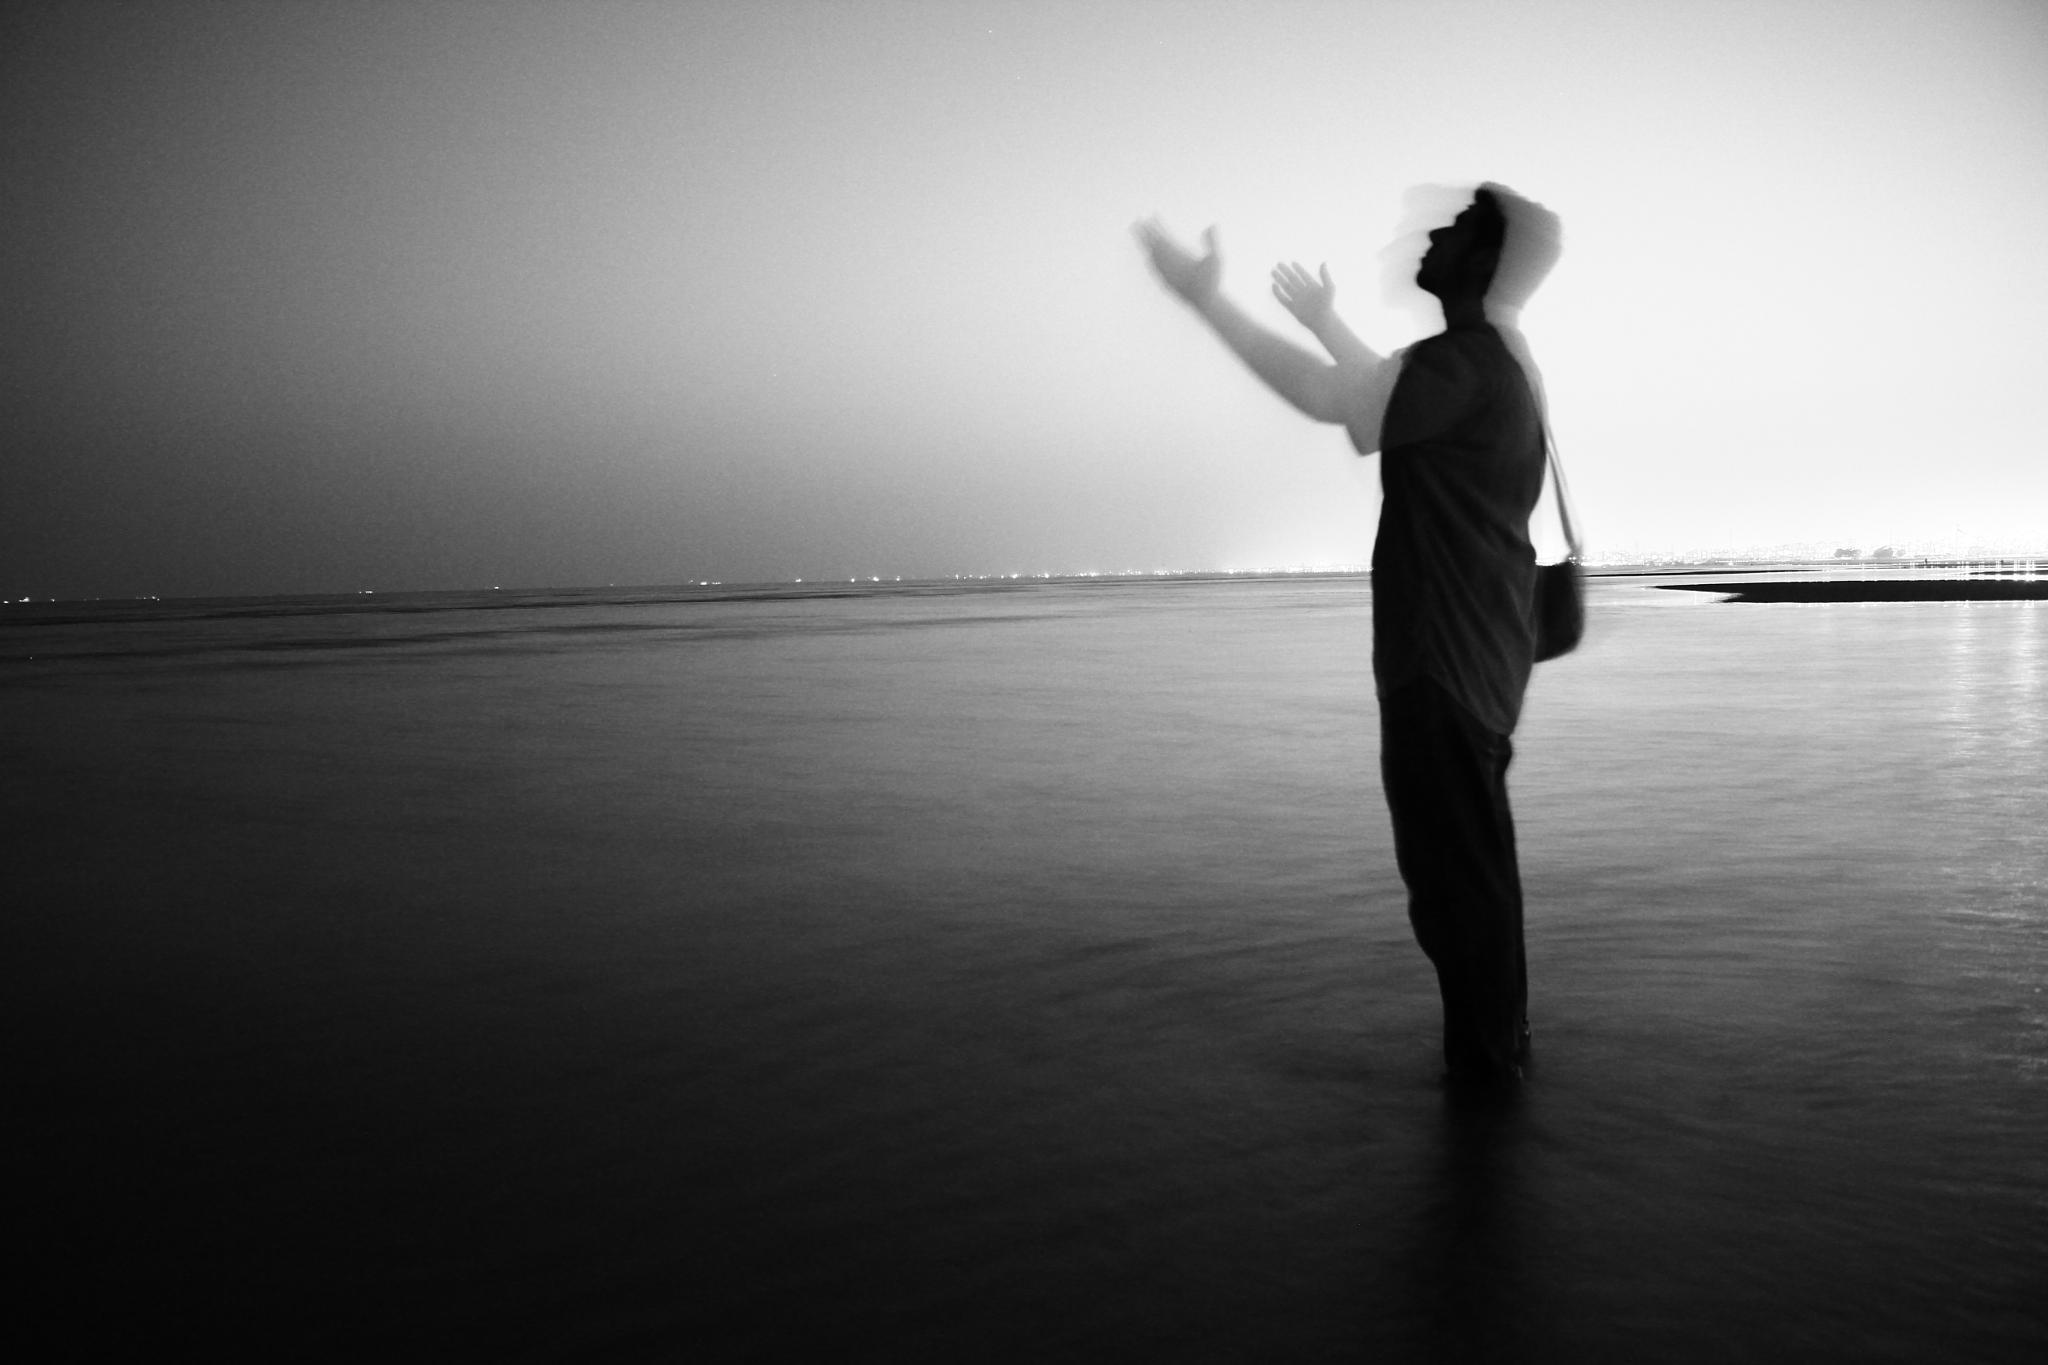 Shadow by Mohammad Hashemi